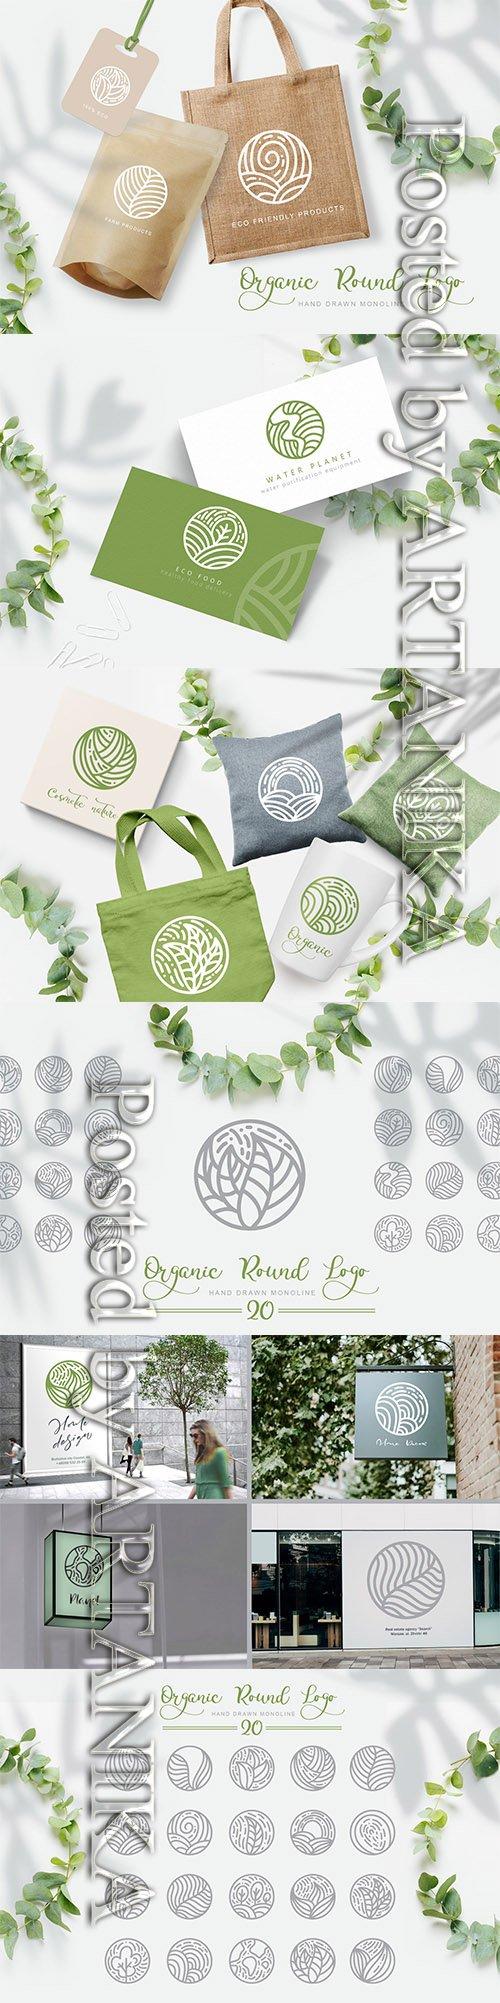 Organic Round Logo